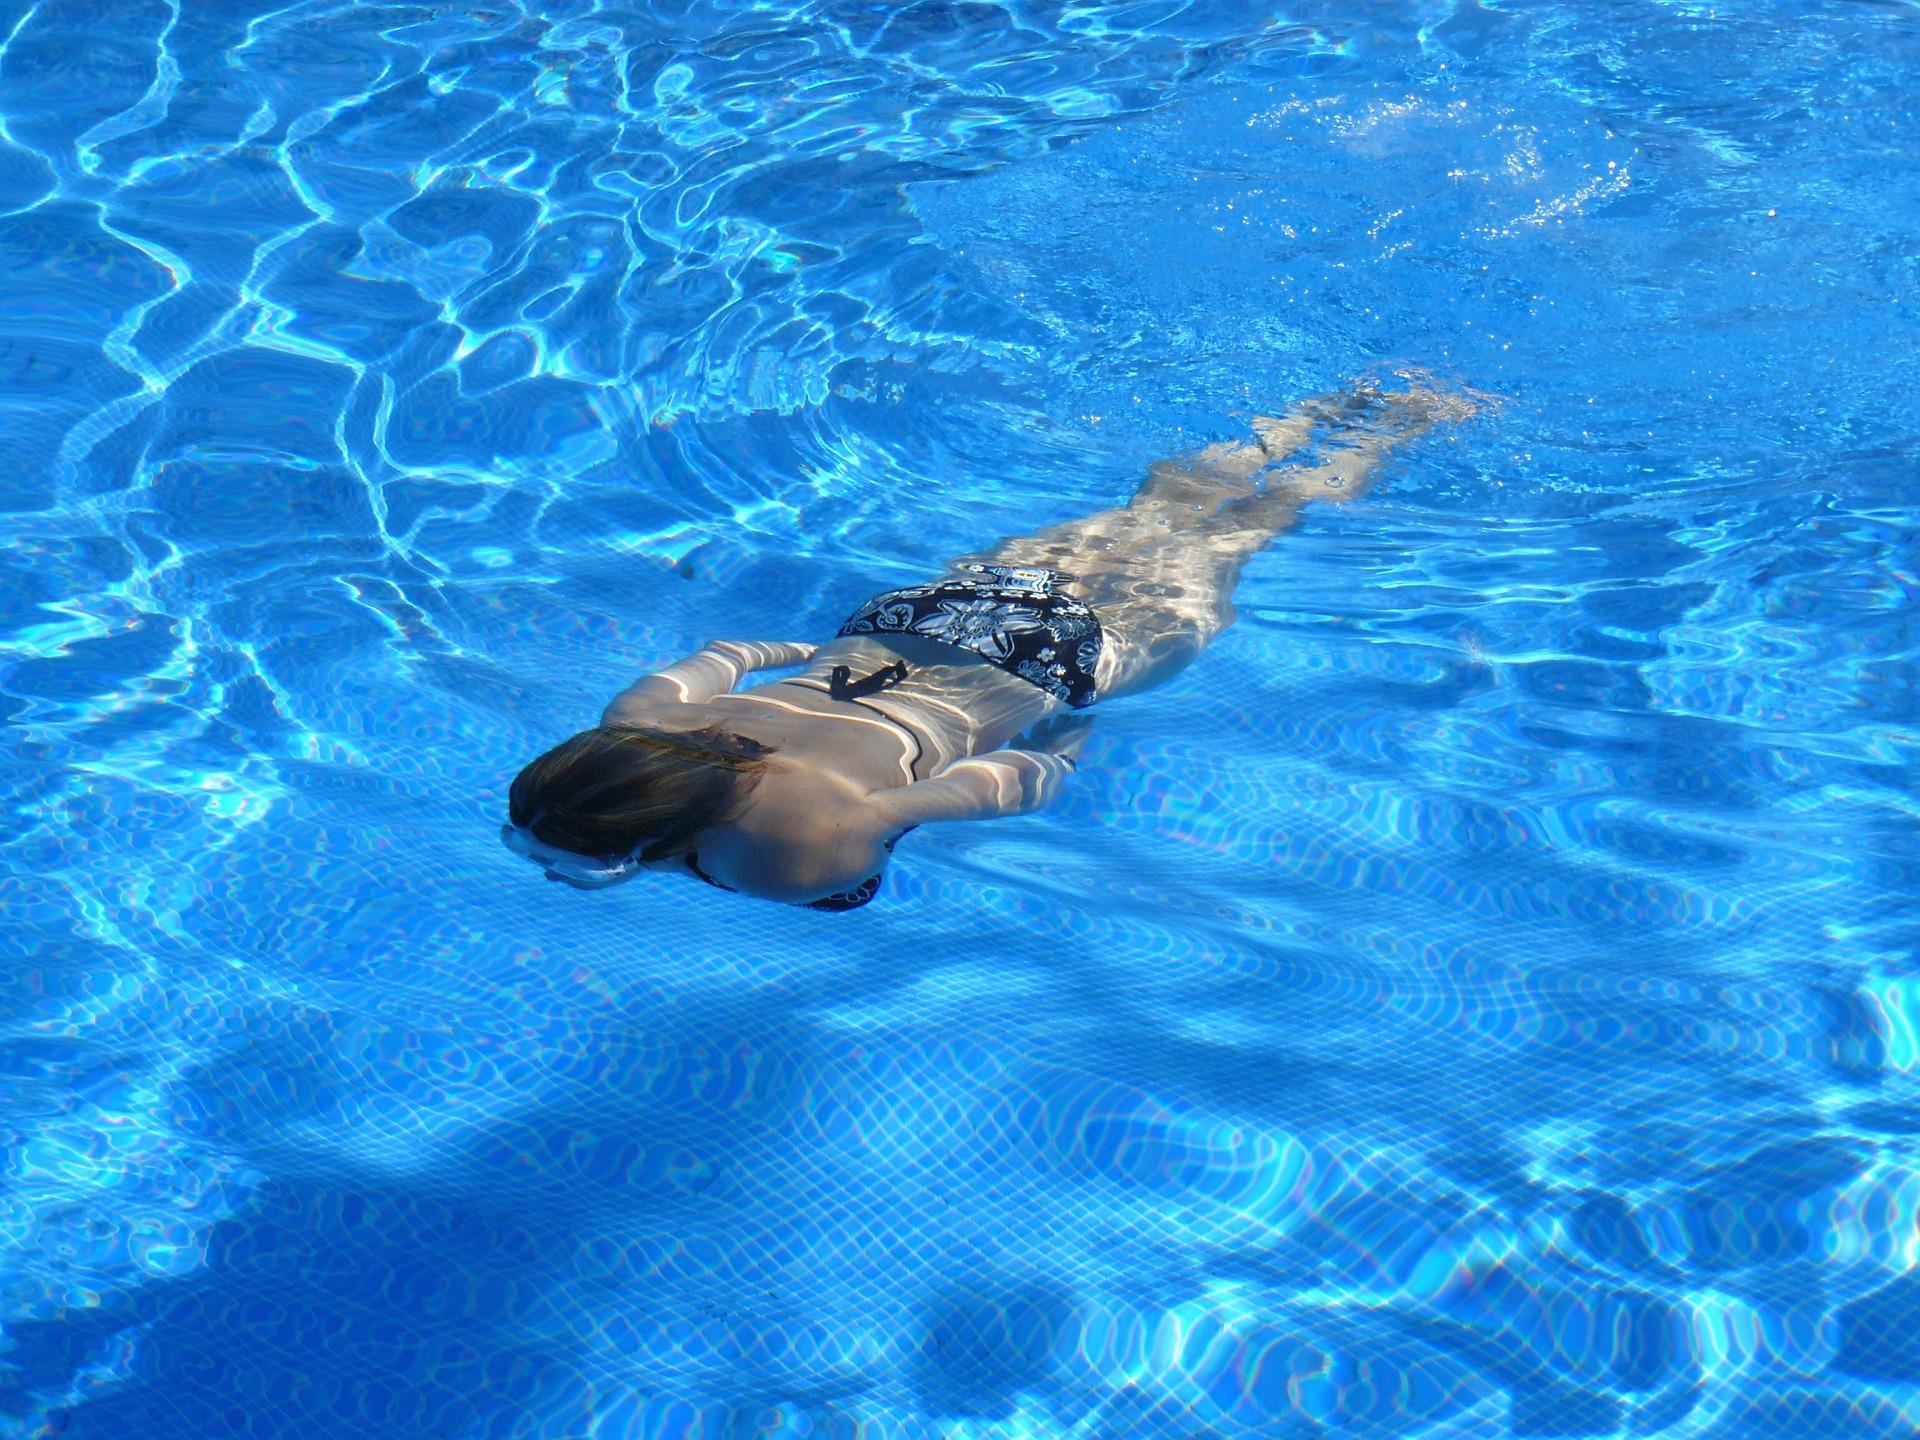 Lista de espera de un año para construir tu propia piscina en casa